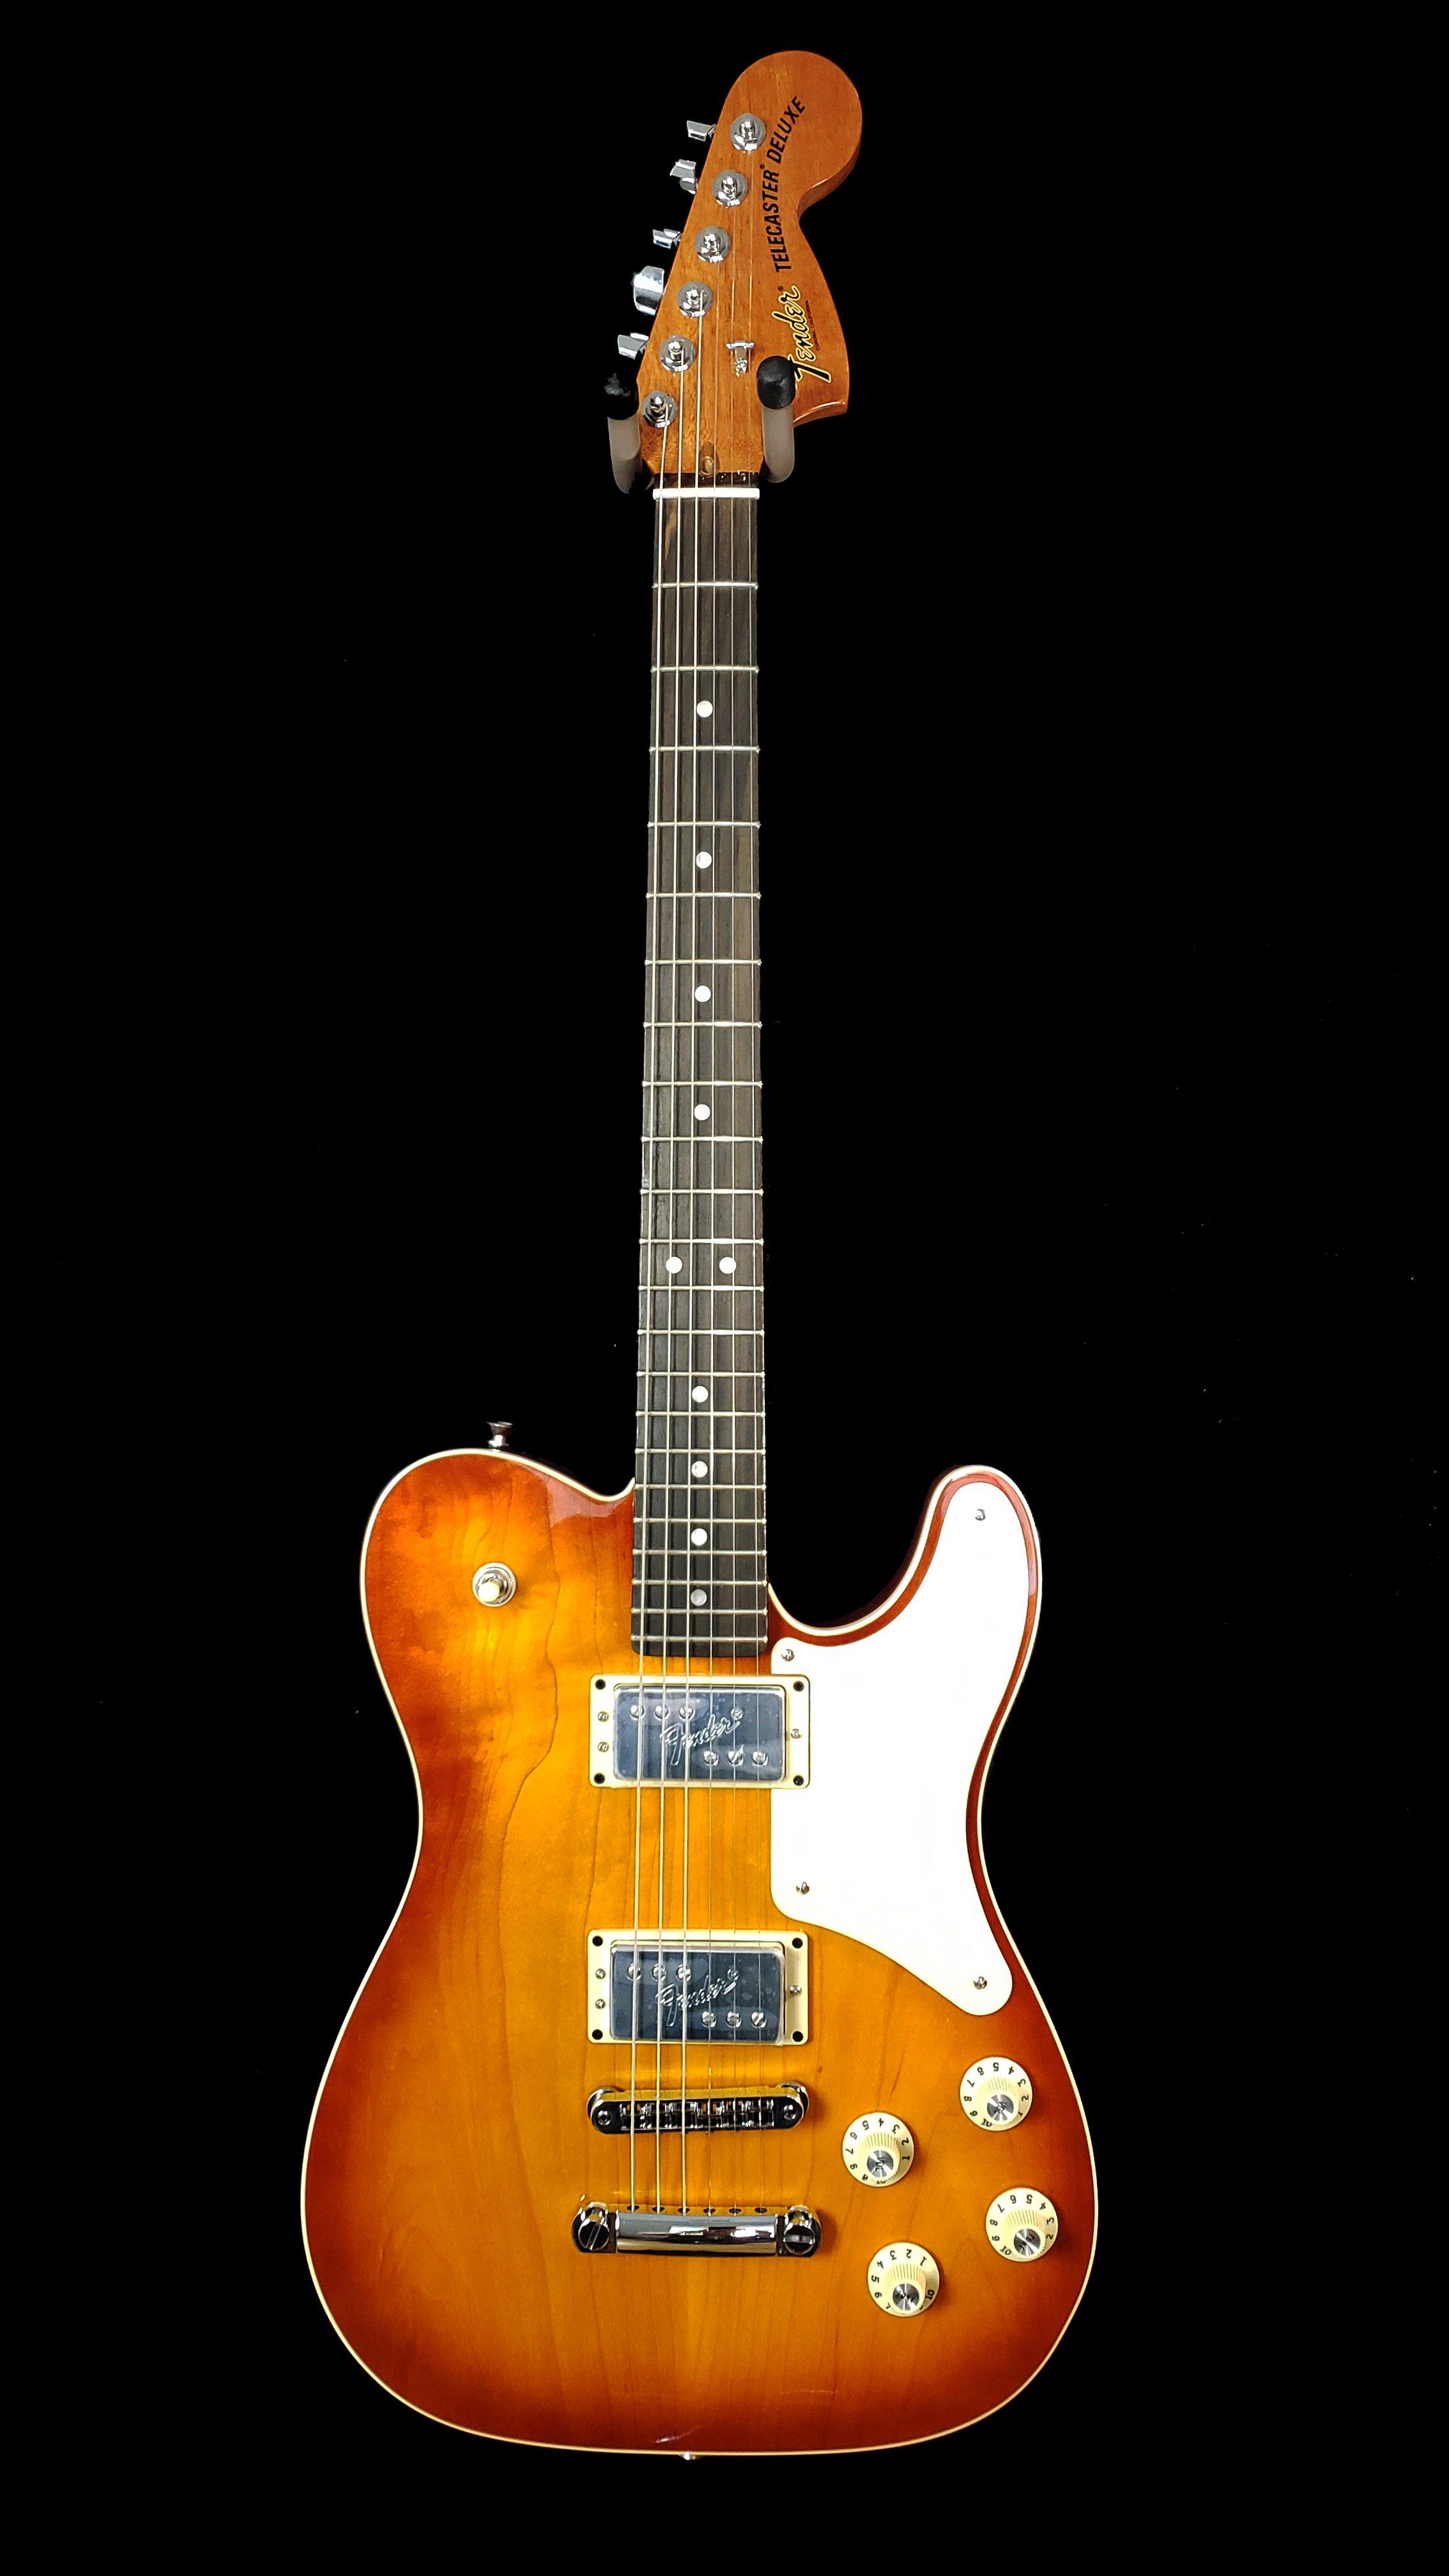 Fender Parallel Universe Troublemaker Telecaster